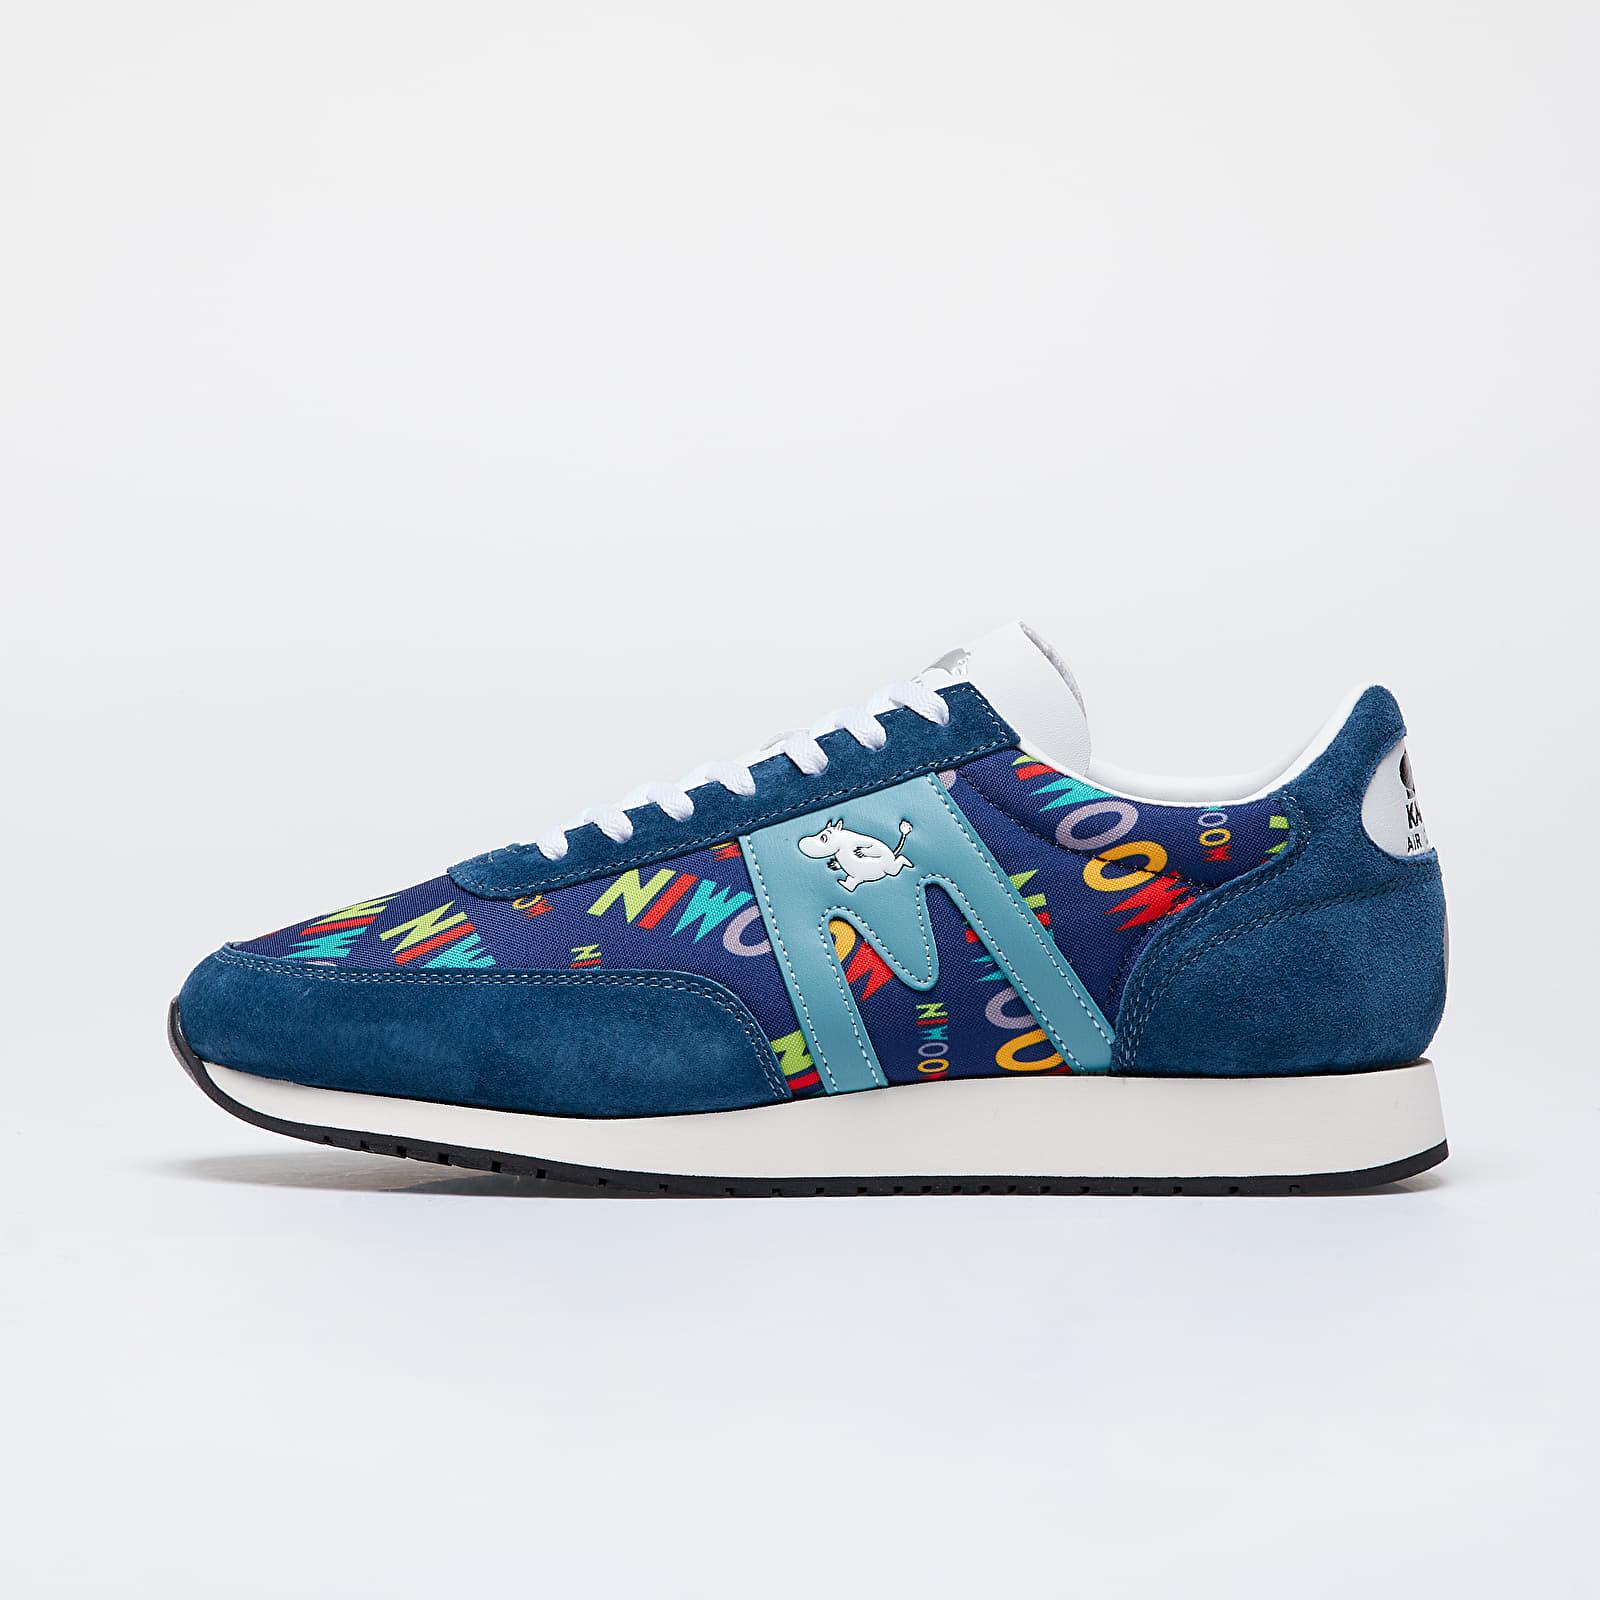 Pánské tenisky a boty Karhu x Moomin Albatross 82 Stellar/ Cameo Blue